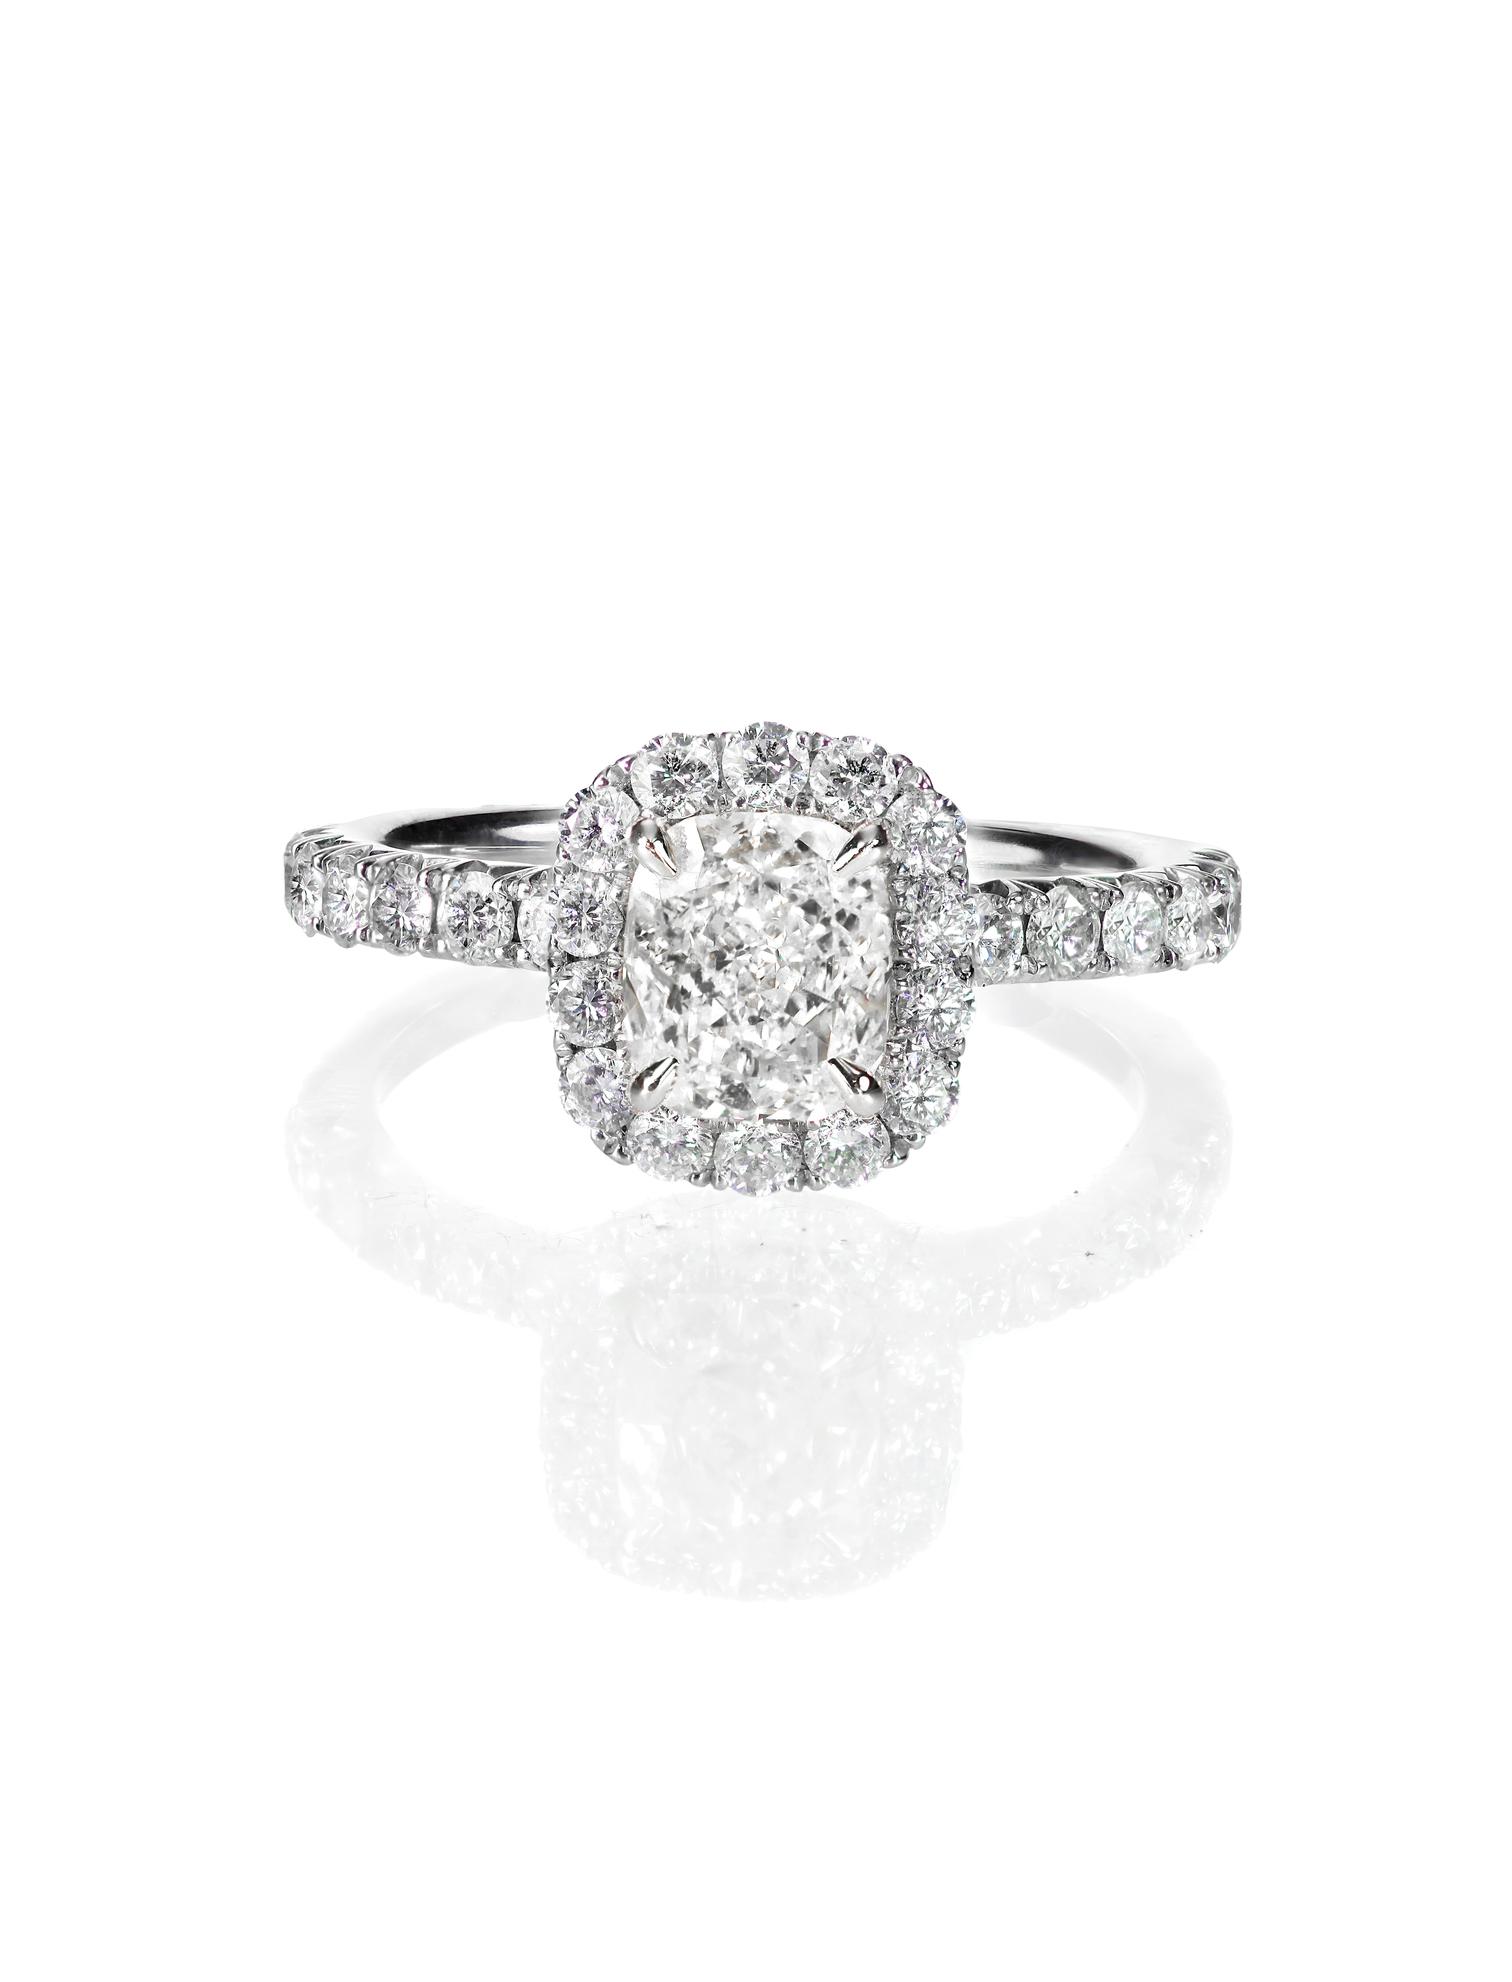 Cushion Cut - Halo - Engagement Ring